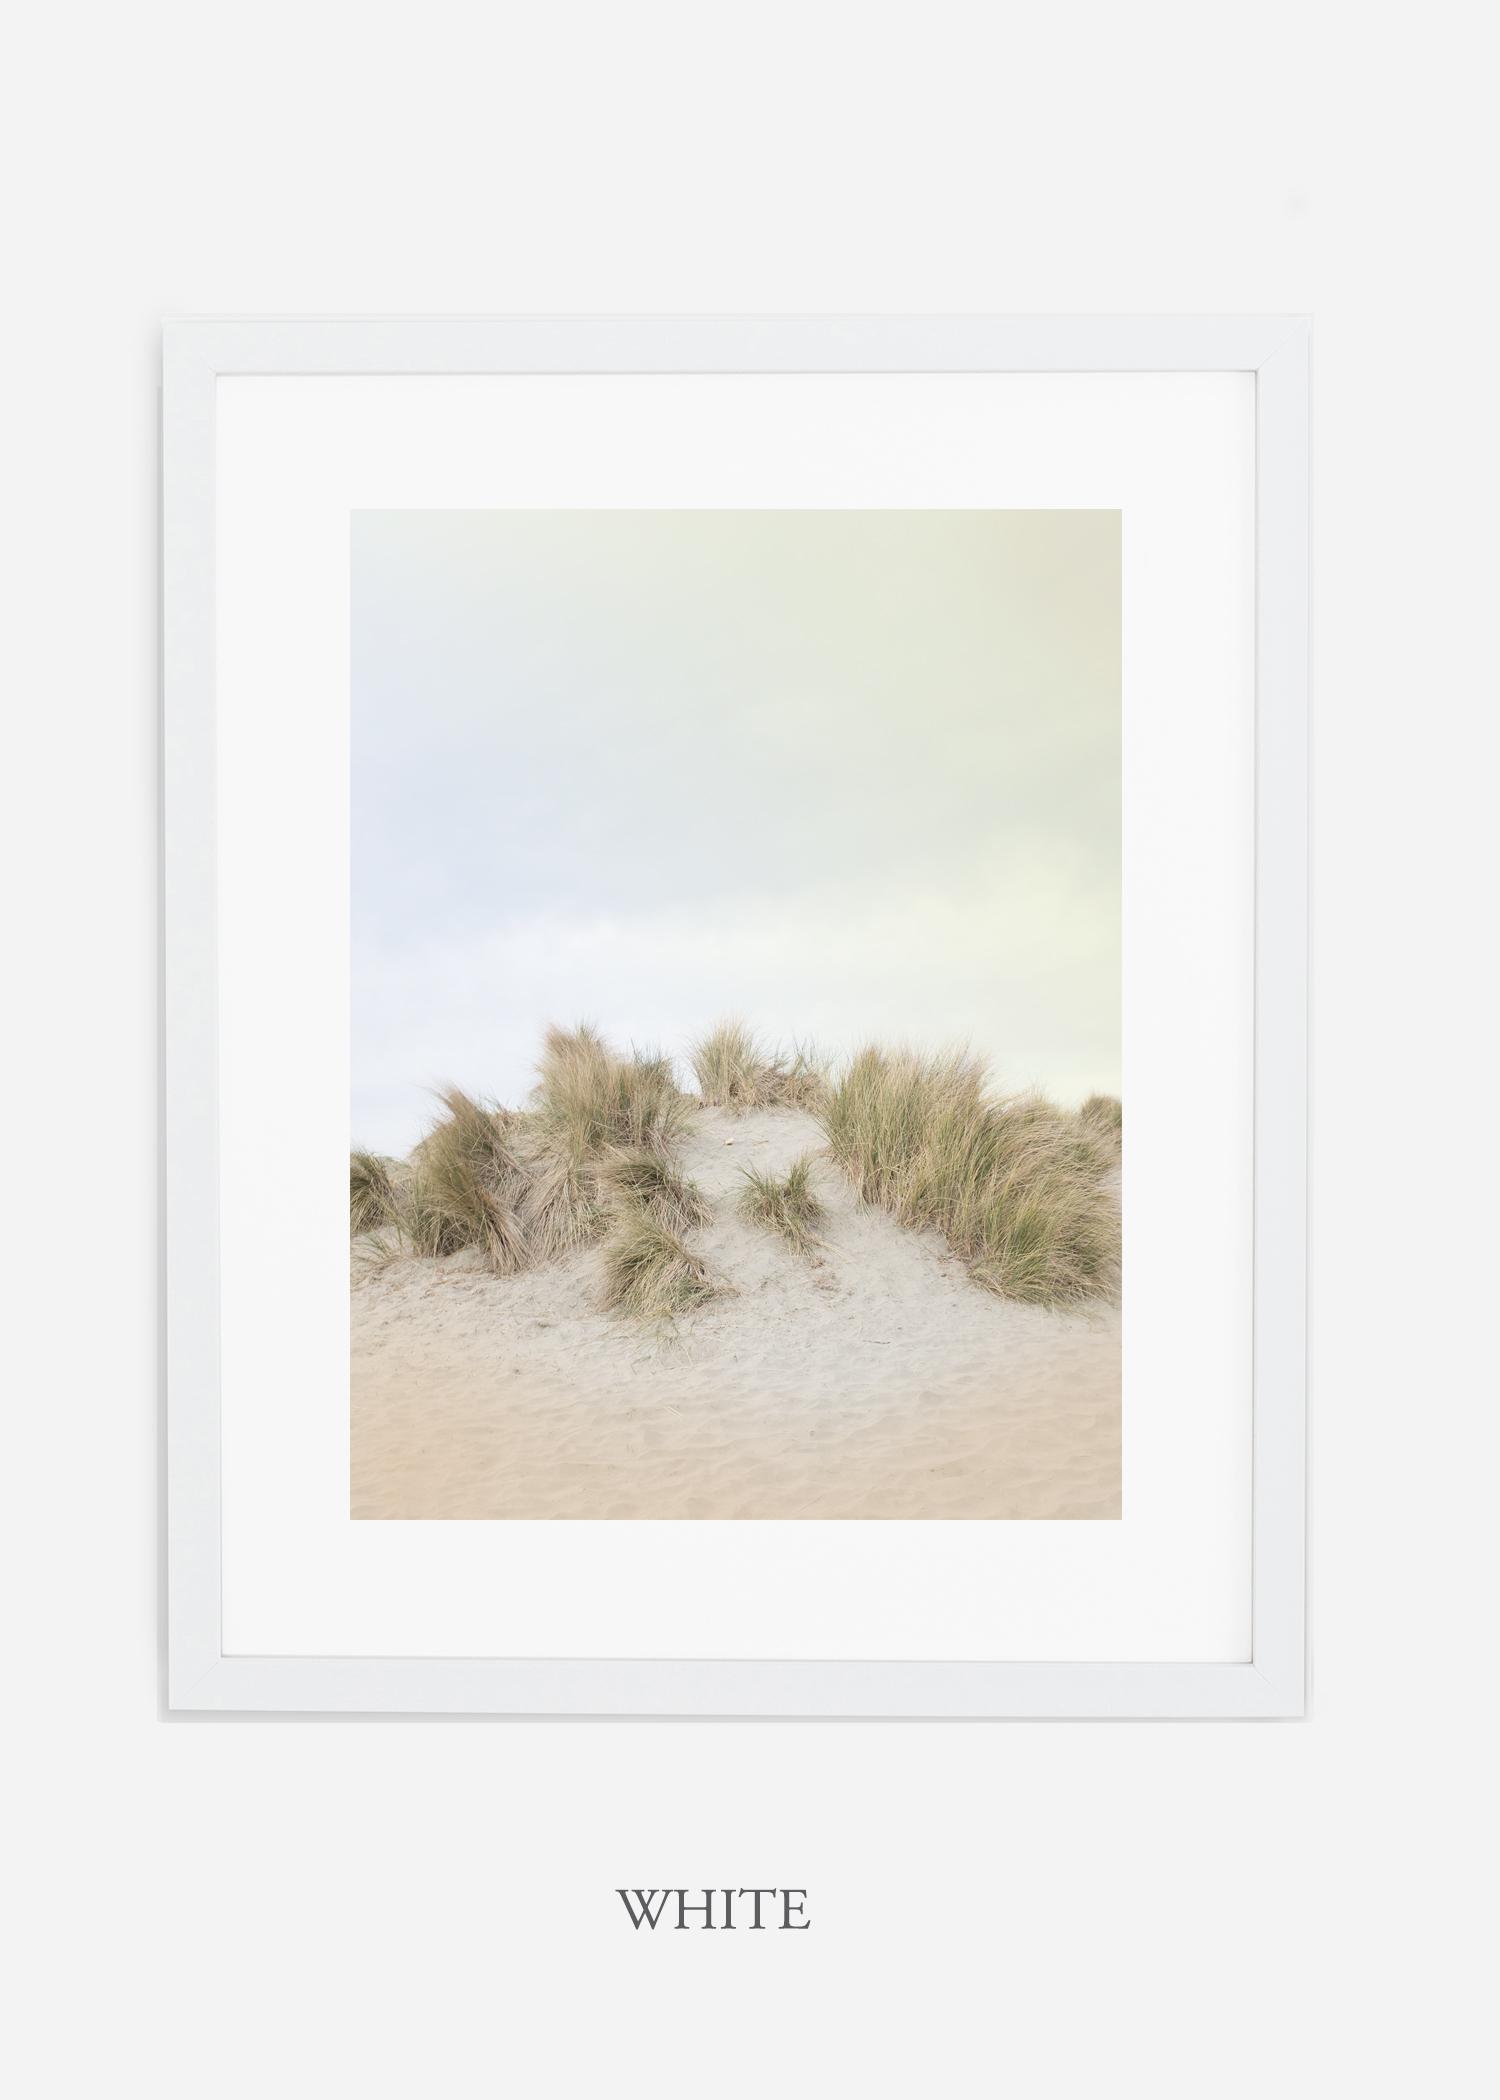 DunesNo.2_whiteframe_BigSur_Ocean_Beach__Art_Photography_interiordesign_bohemian_cactusart.jpg